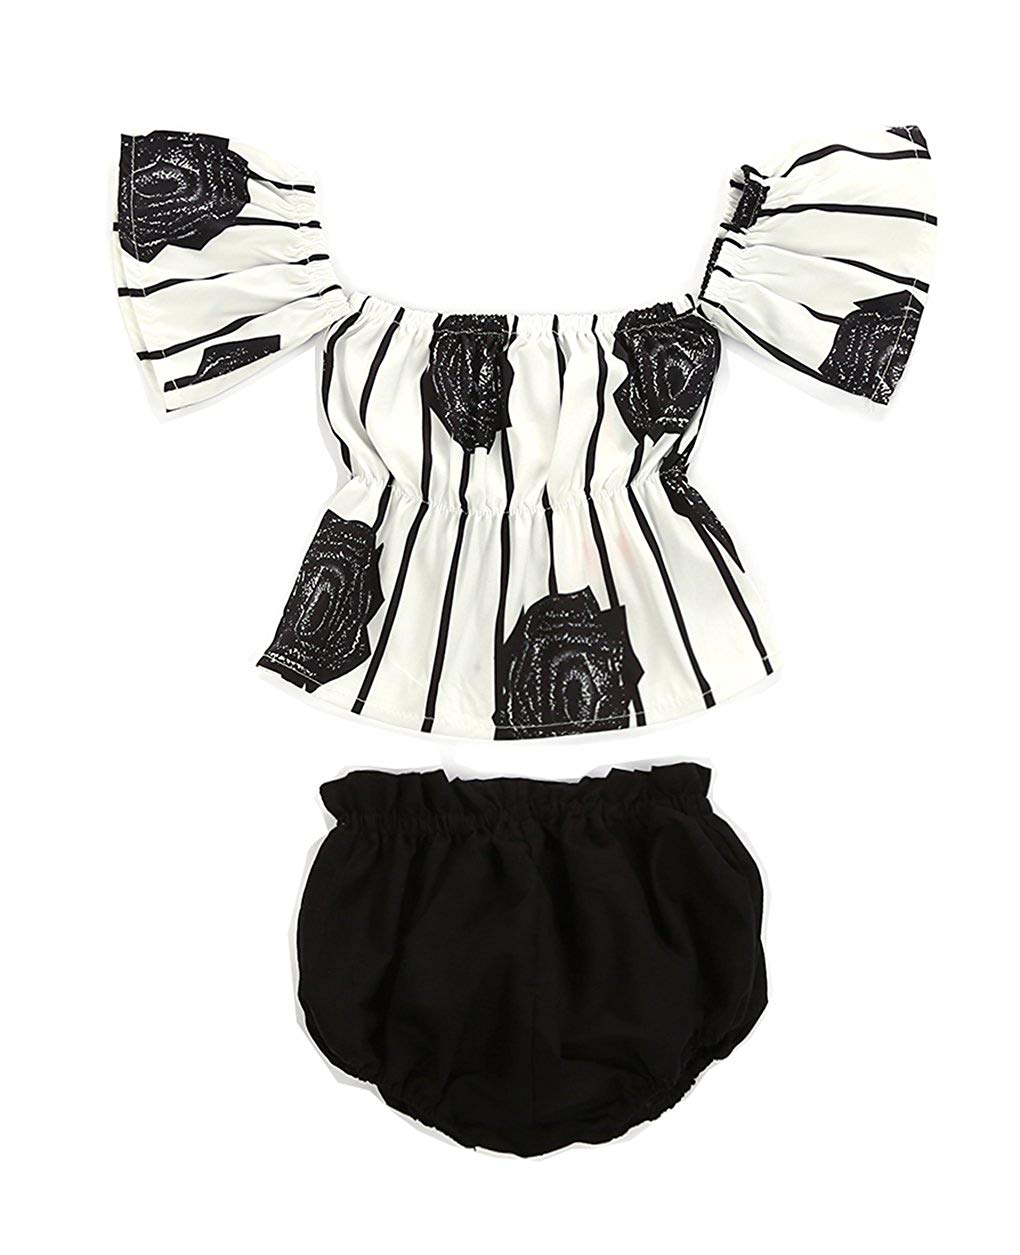 5114046f99c1 Get Quotations · Urkutoba 2pcs Baby Girl Black Rose Floral Black Stripes  Print Off Shoulder Ruffle Sleeve T-